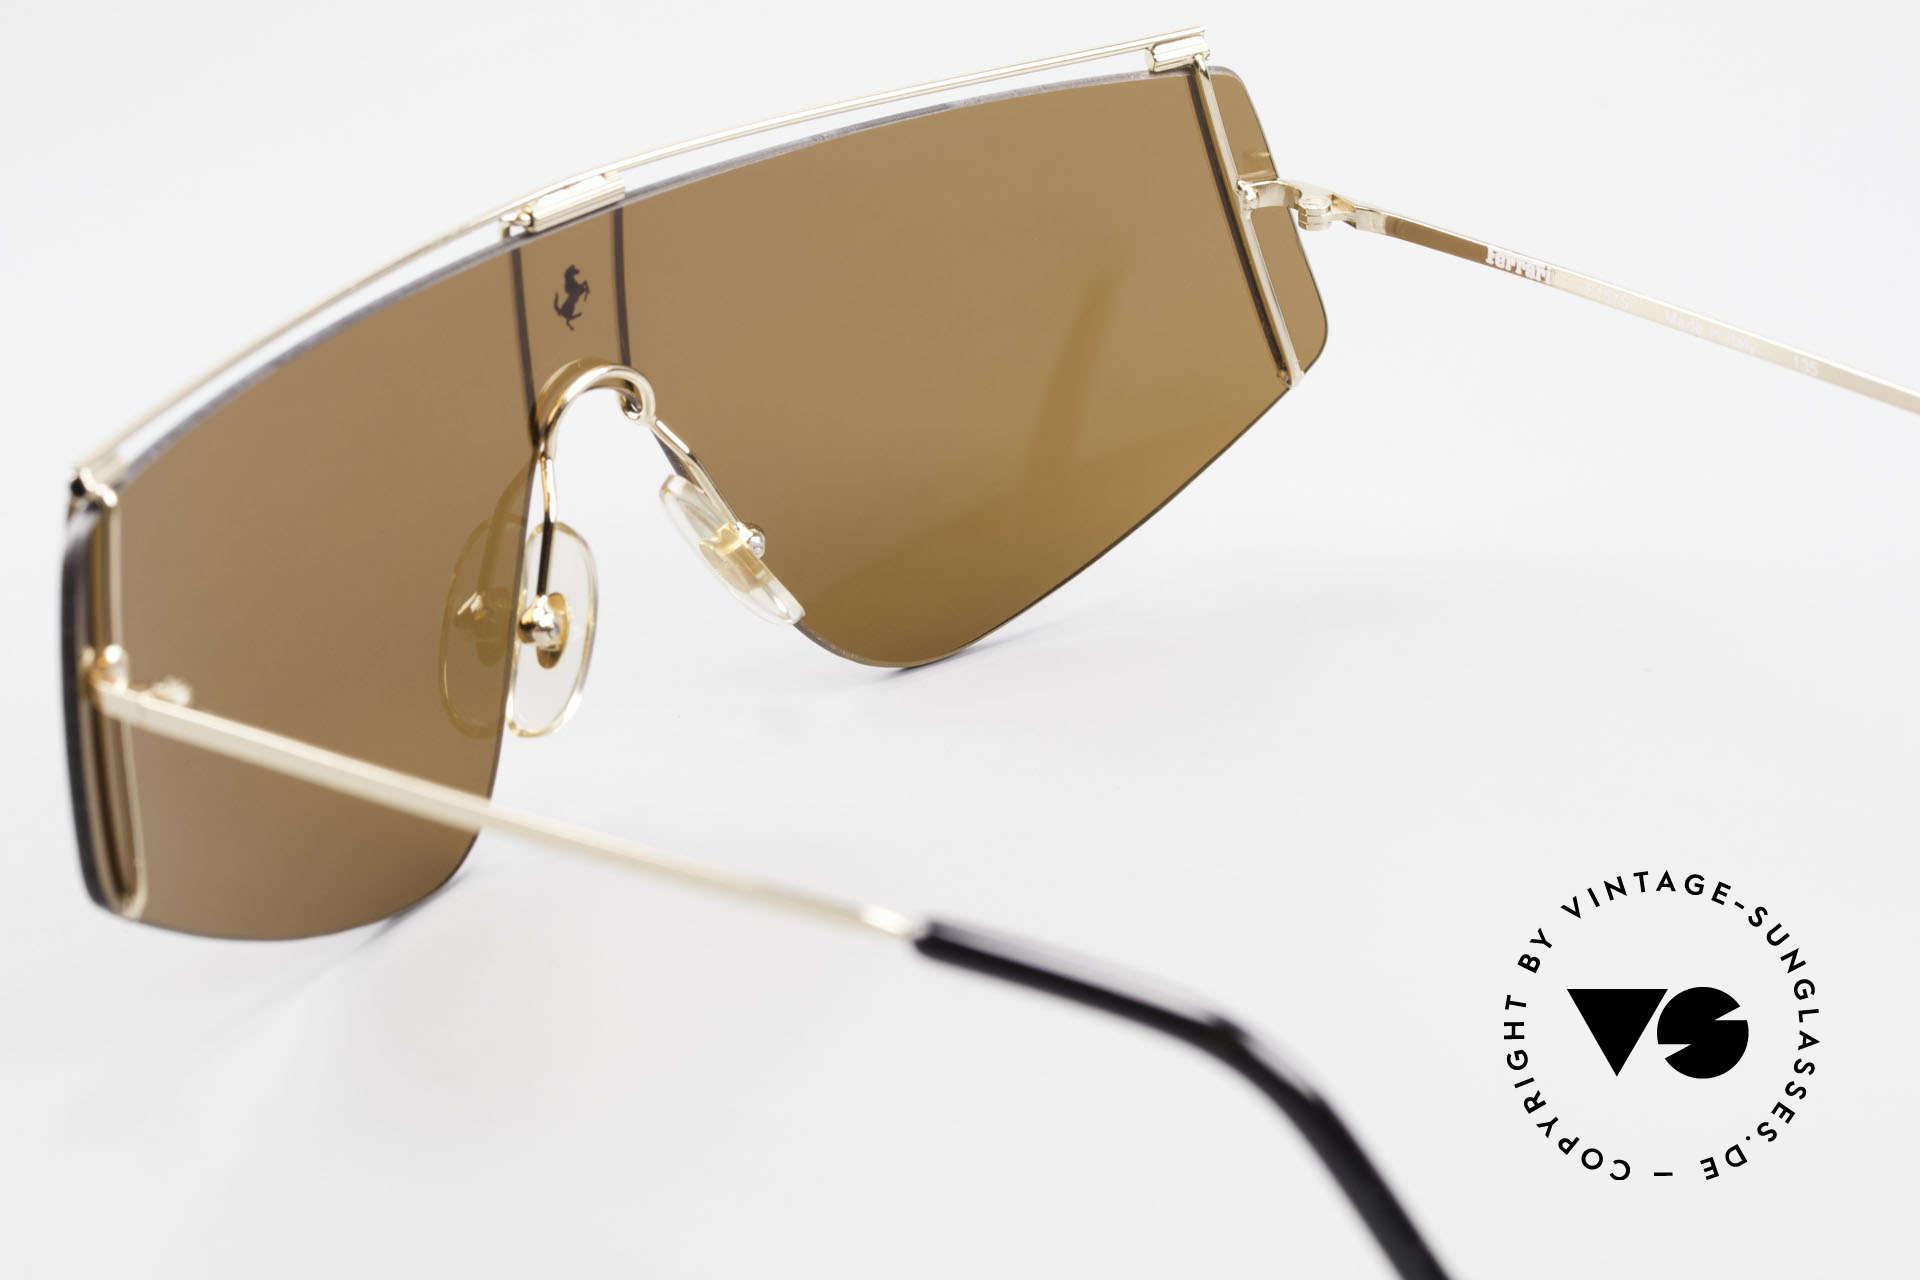 Ferrari F15/S Luxury Sports Sunglasses 90's, Size: medium, Made for Men and Women